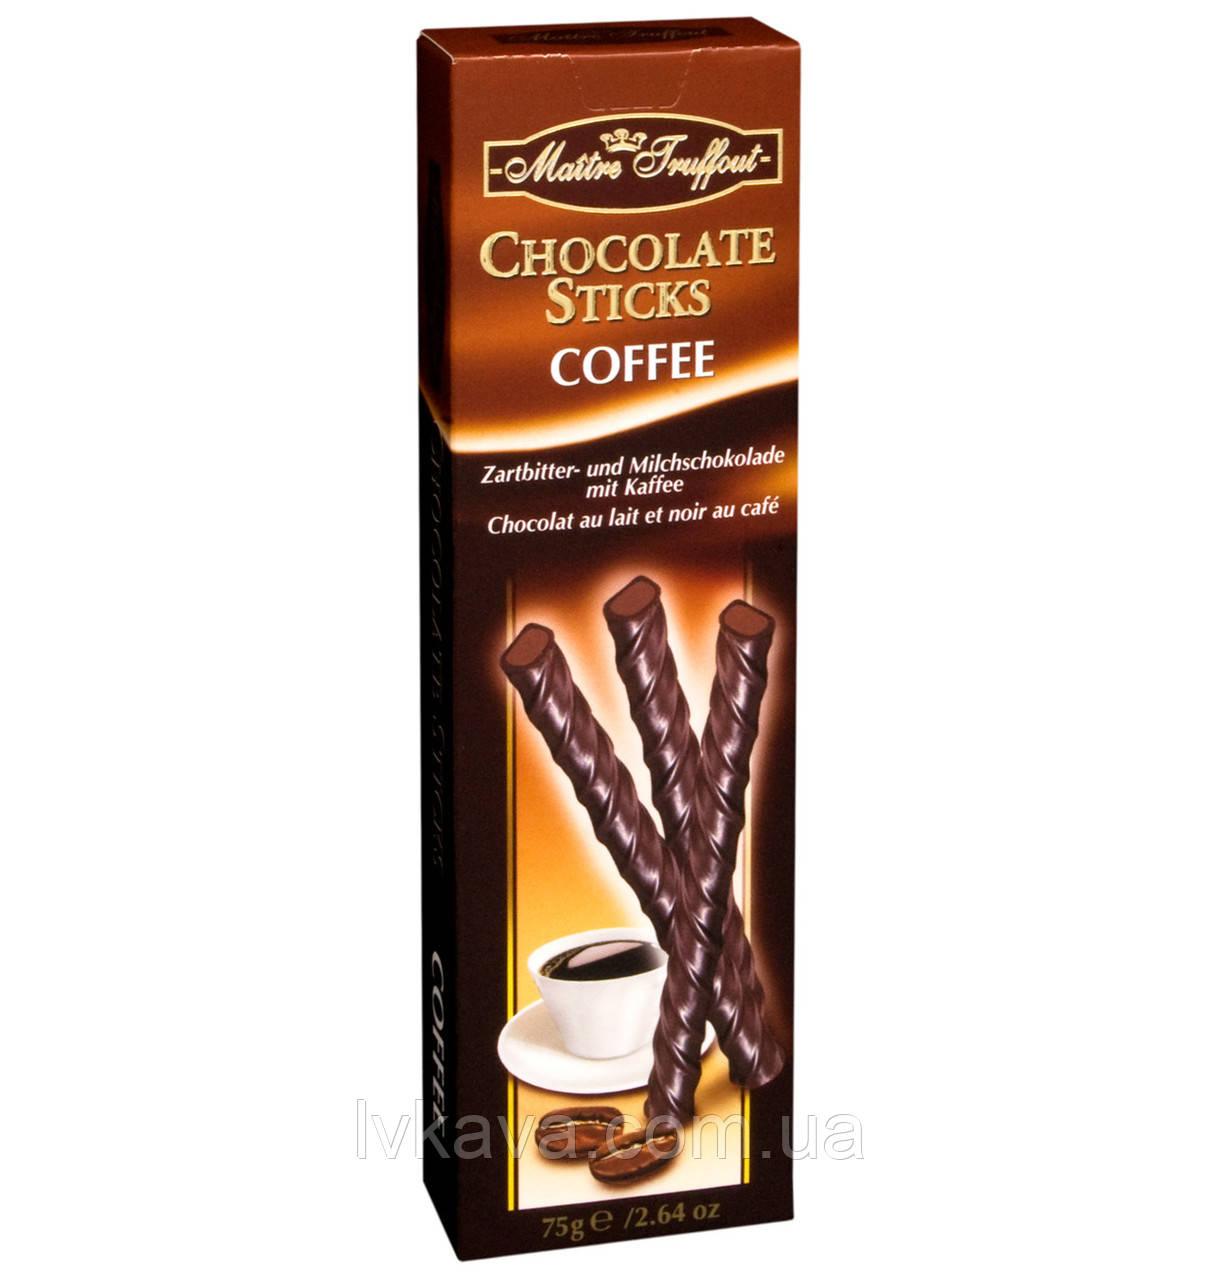 Черный шоколад Chocolate Sticks Coffee  Maitre Truffout  , 75 гр